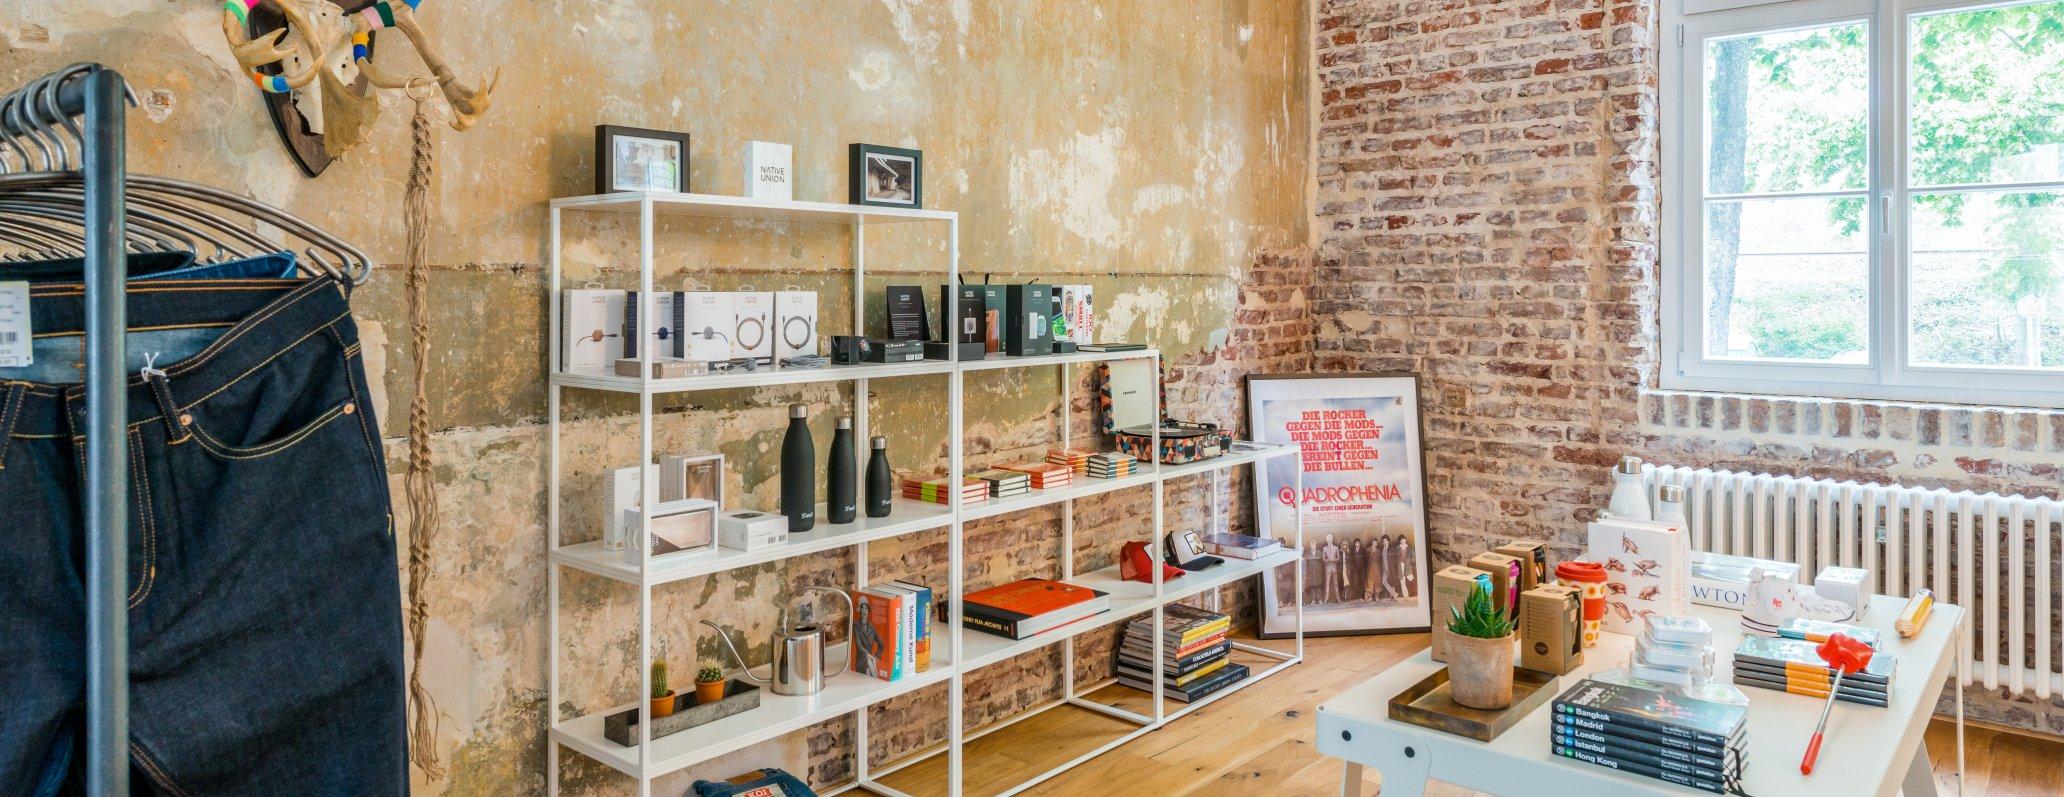 P4 Marketing Düsseldorf Presentation Space